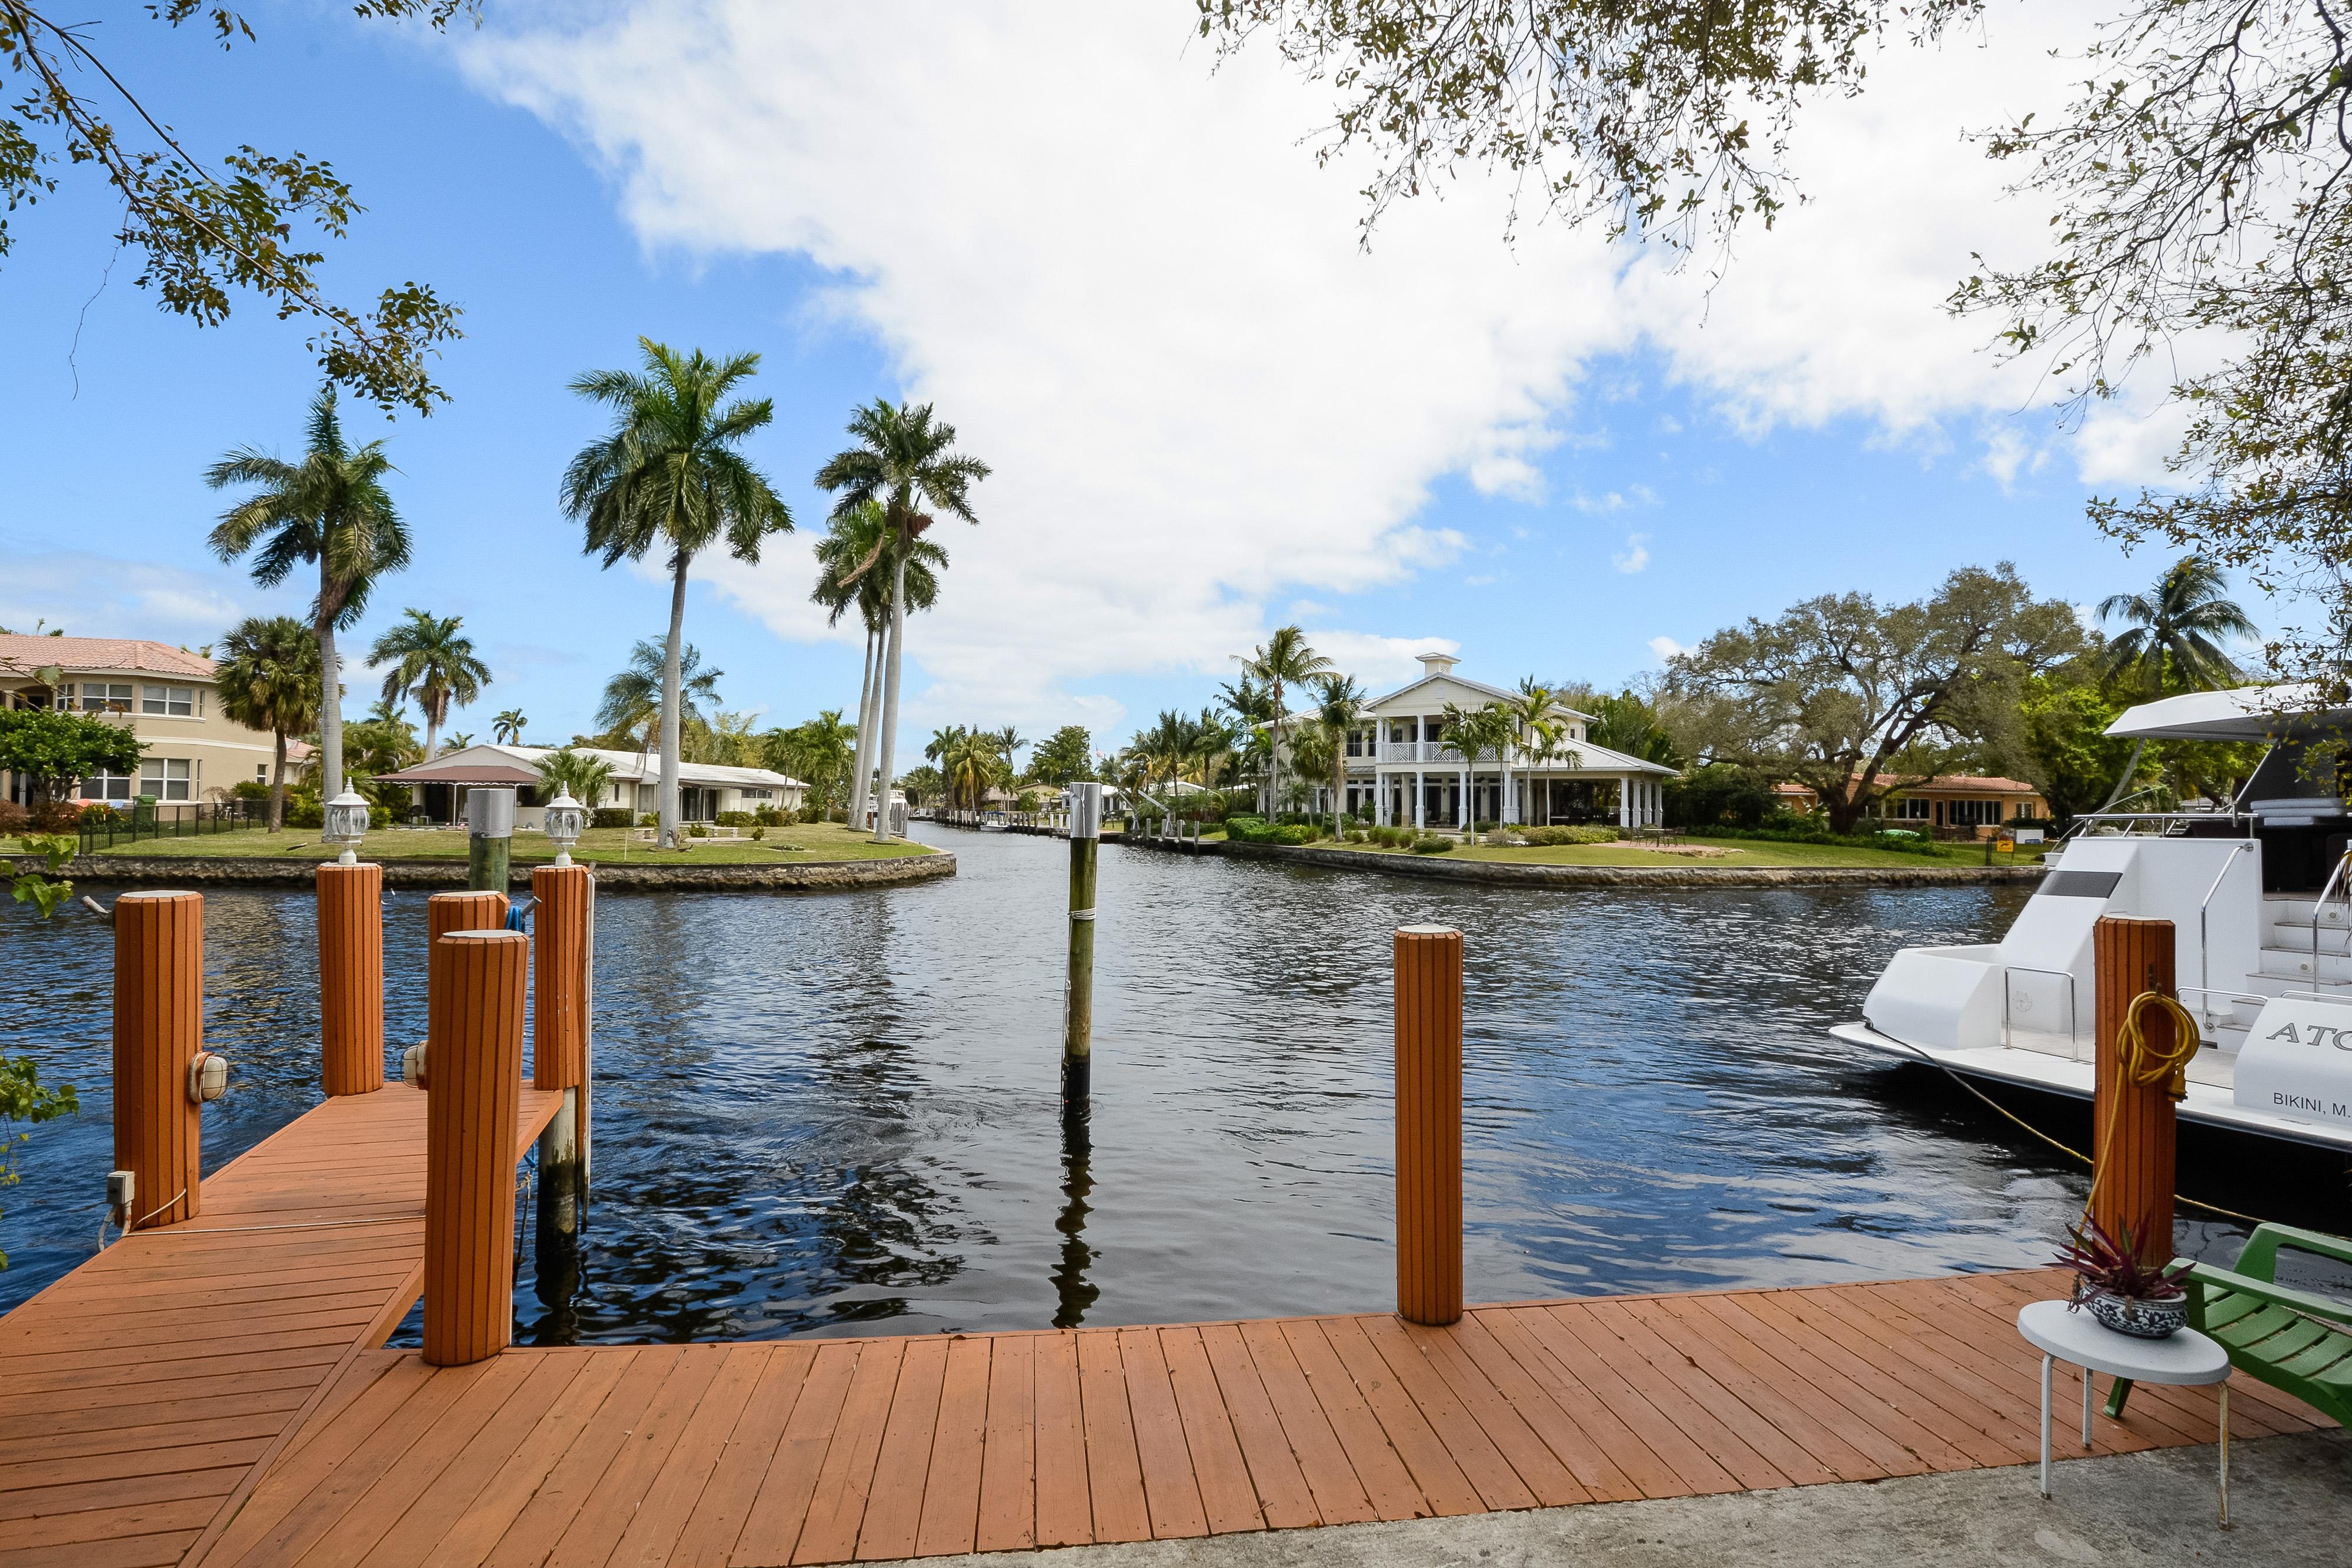 獨棟家庭住宅 為 出售 在 1430 SW 13 CT. 1430 Sw 13th Ct Fort Lauderdale, 佛羅里達州, 33312 美國